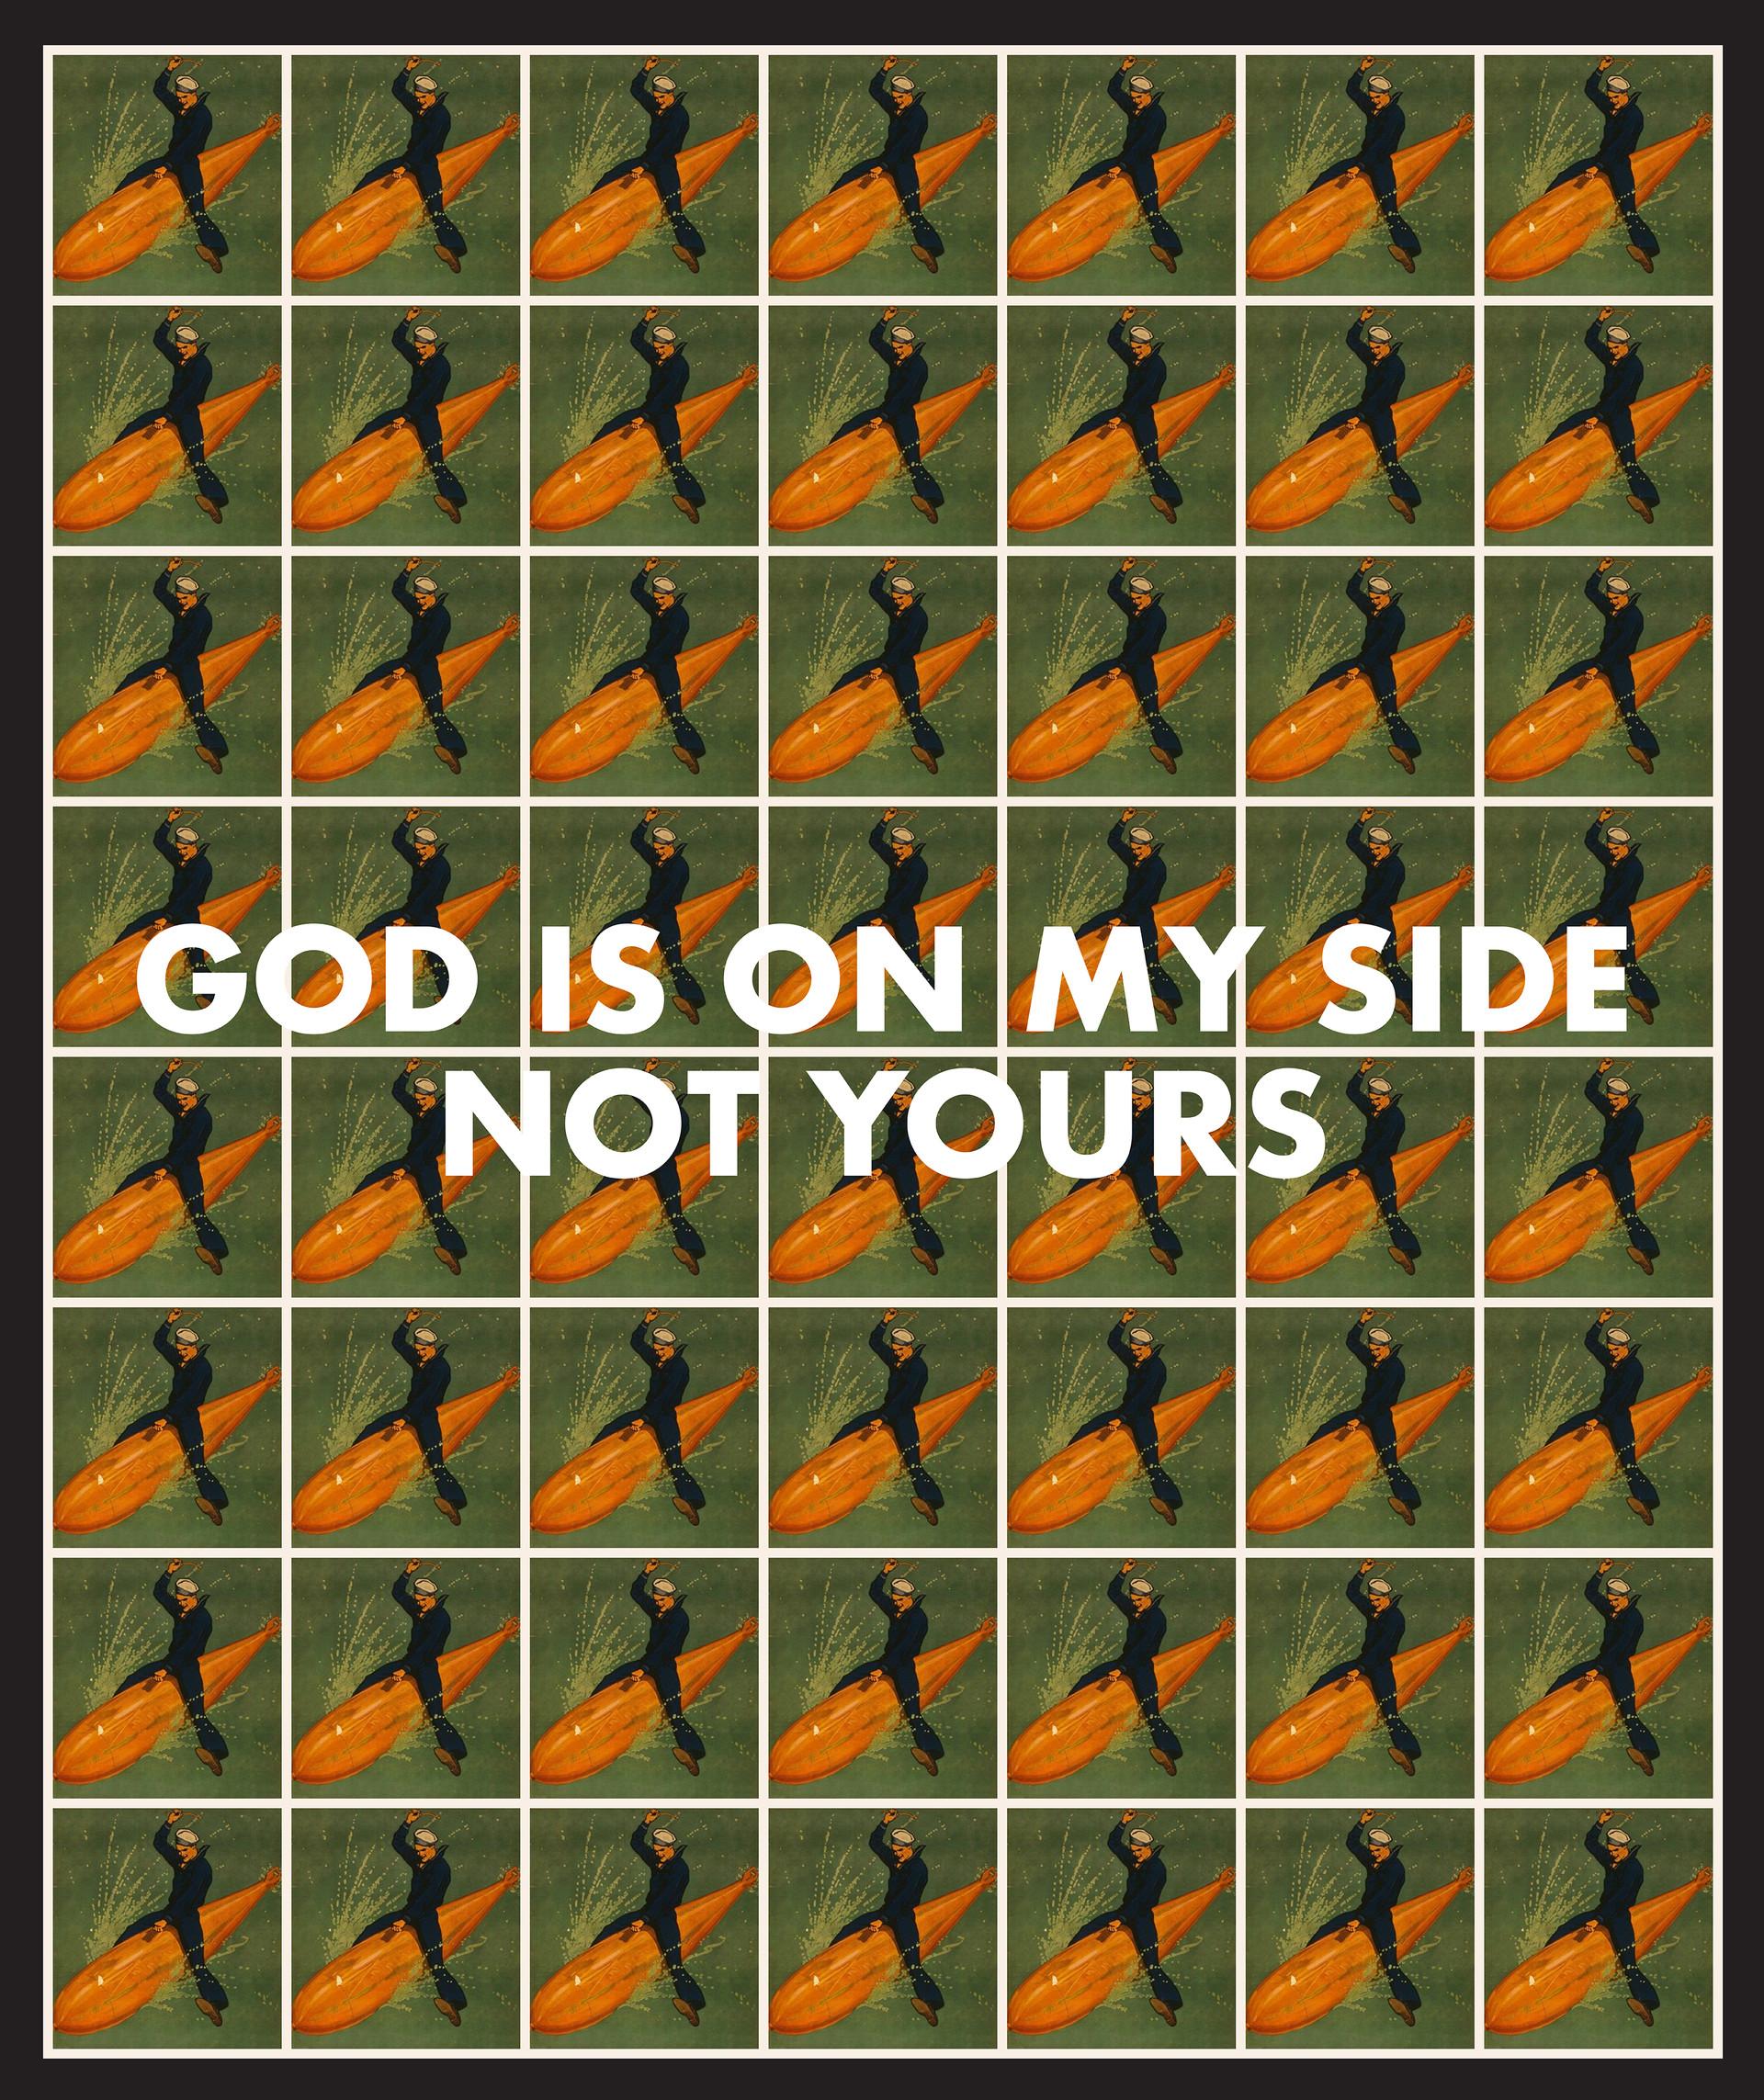 God_Is_On_My_Side.jpg